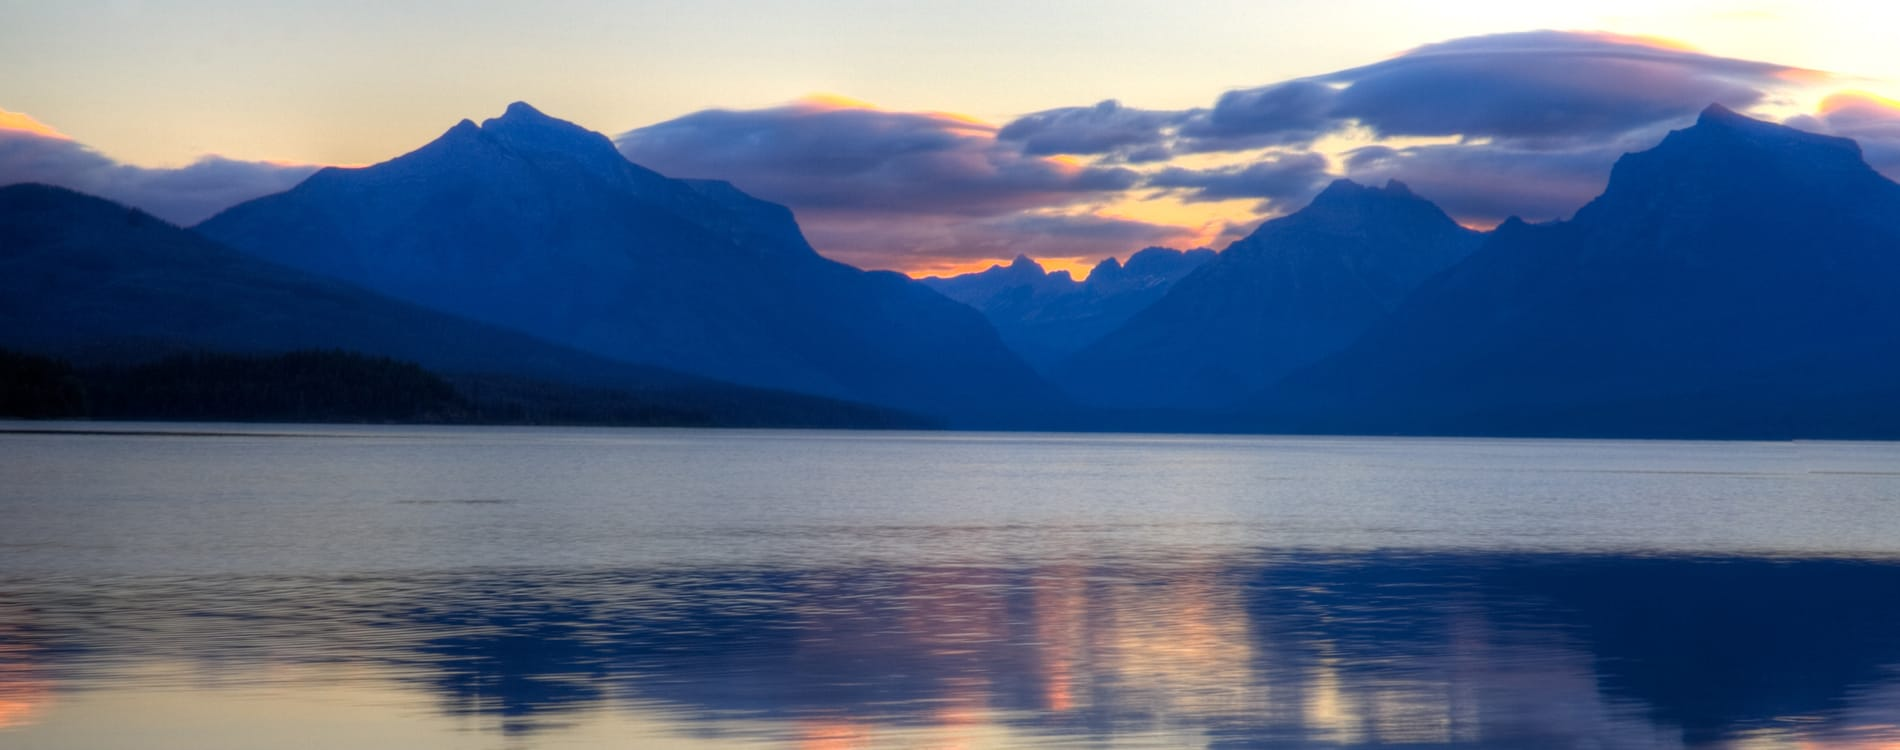 Glacier National Park - Sunrise on Lake McDonald